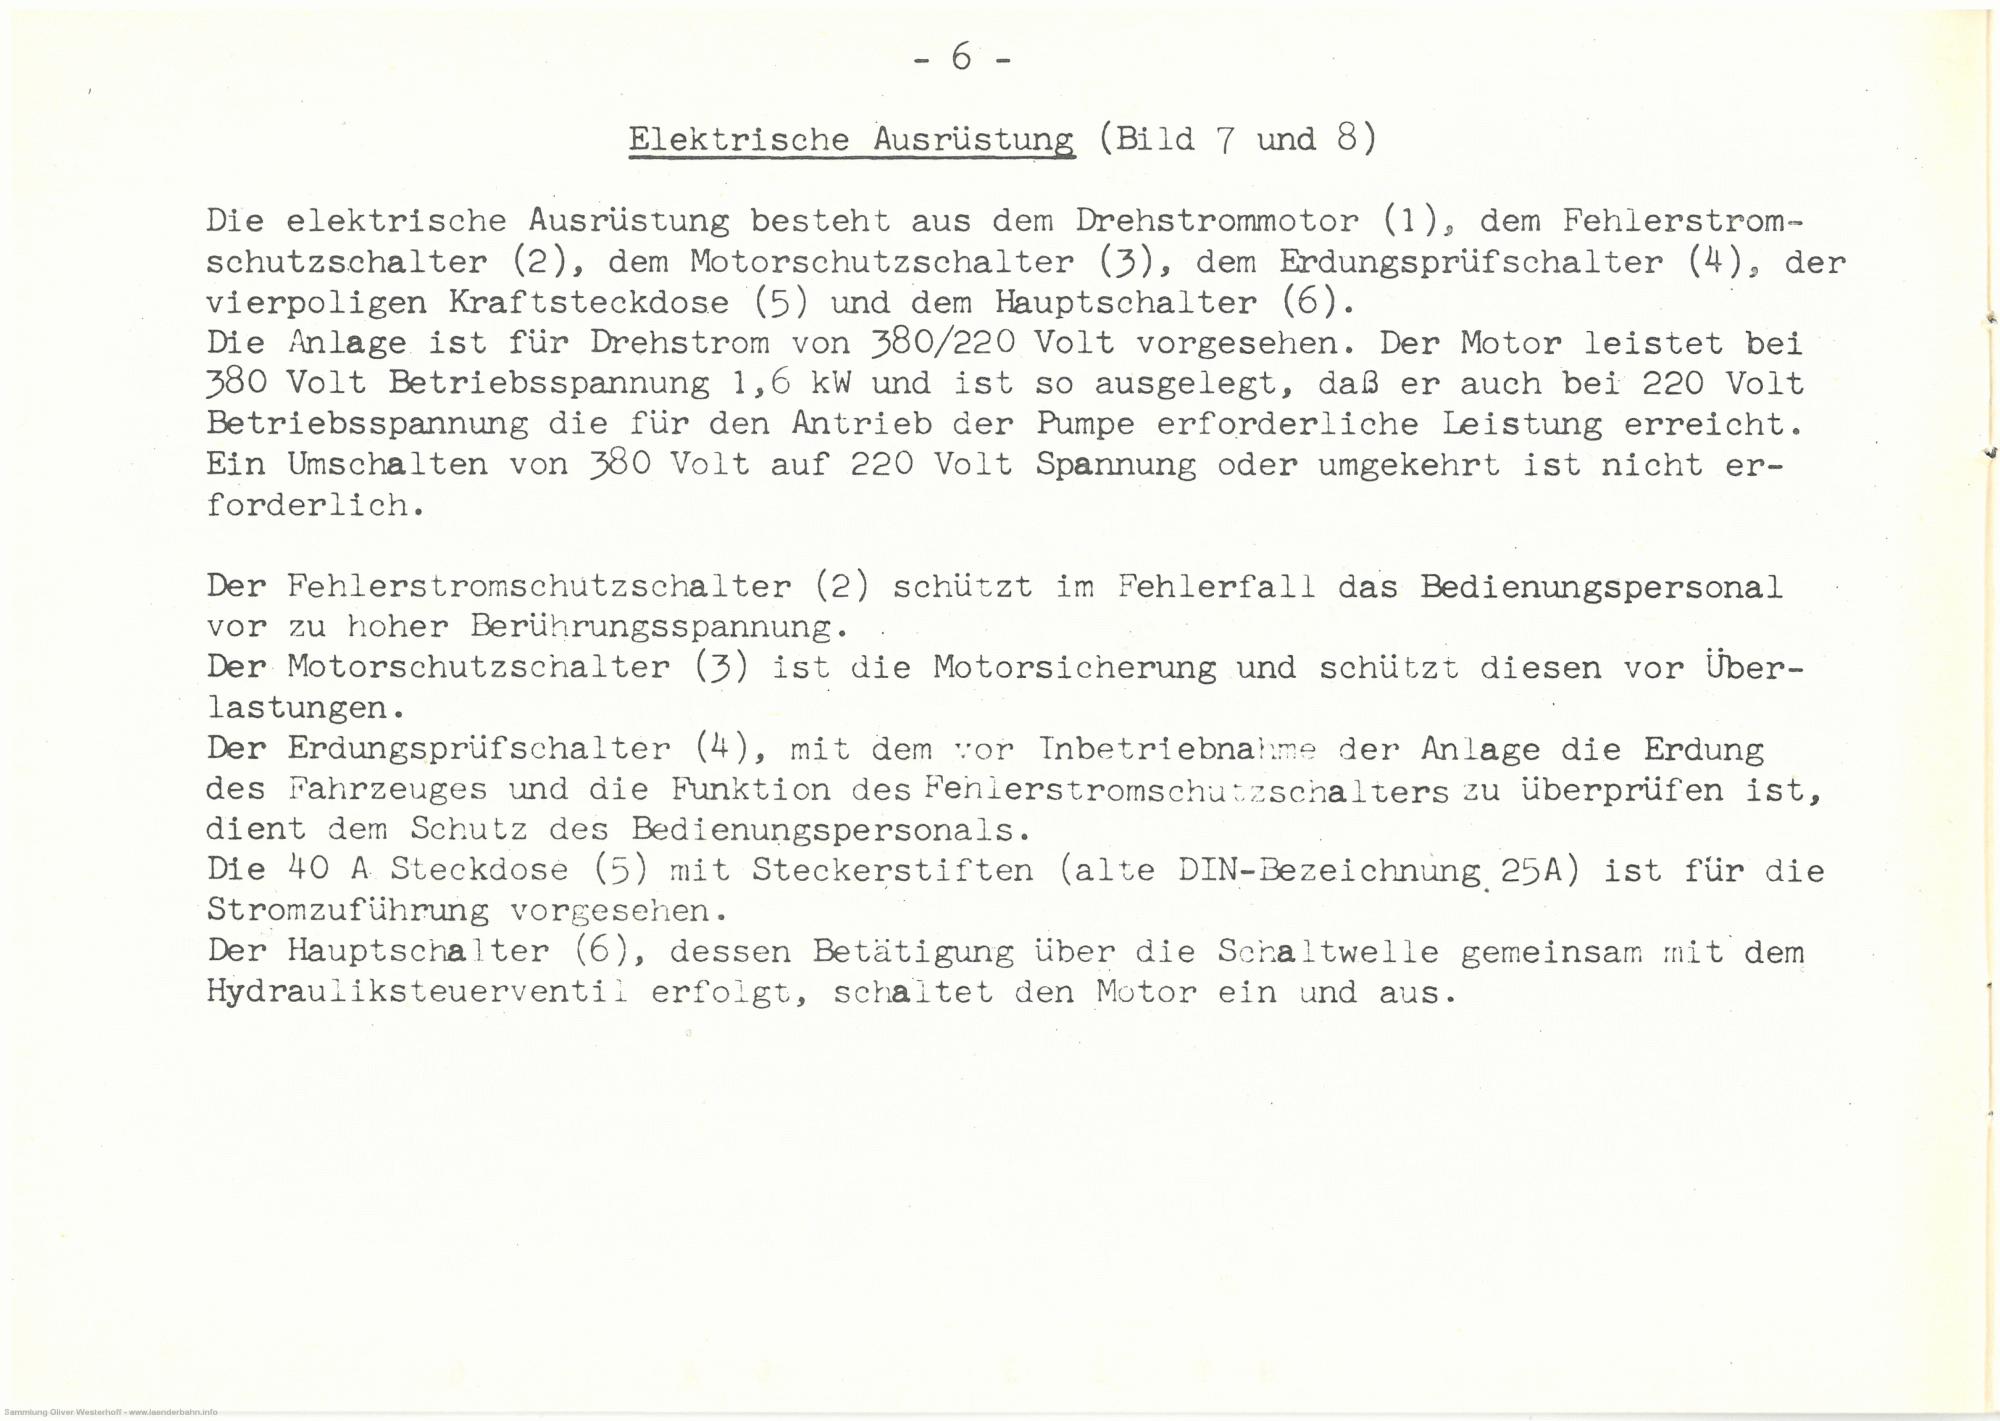 https://www.laenderbahn.info/hifo/20181008/ommv72_seite_0010.png